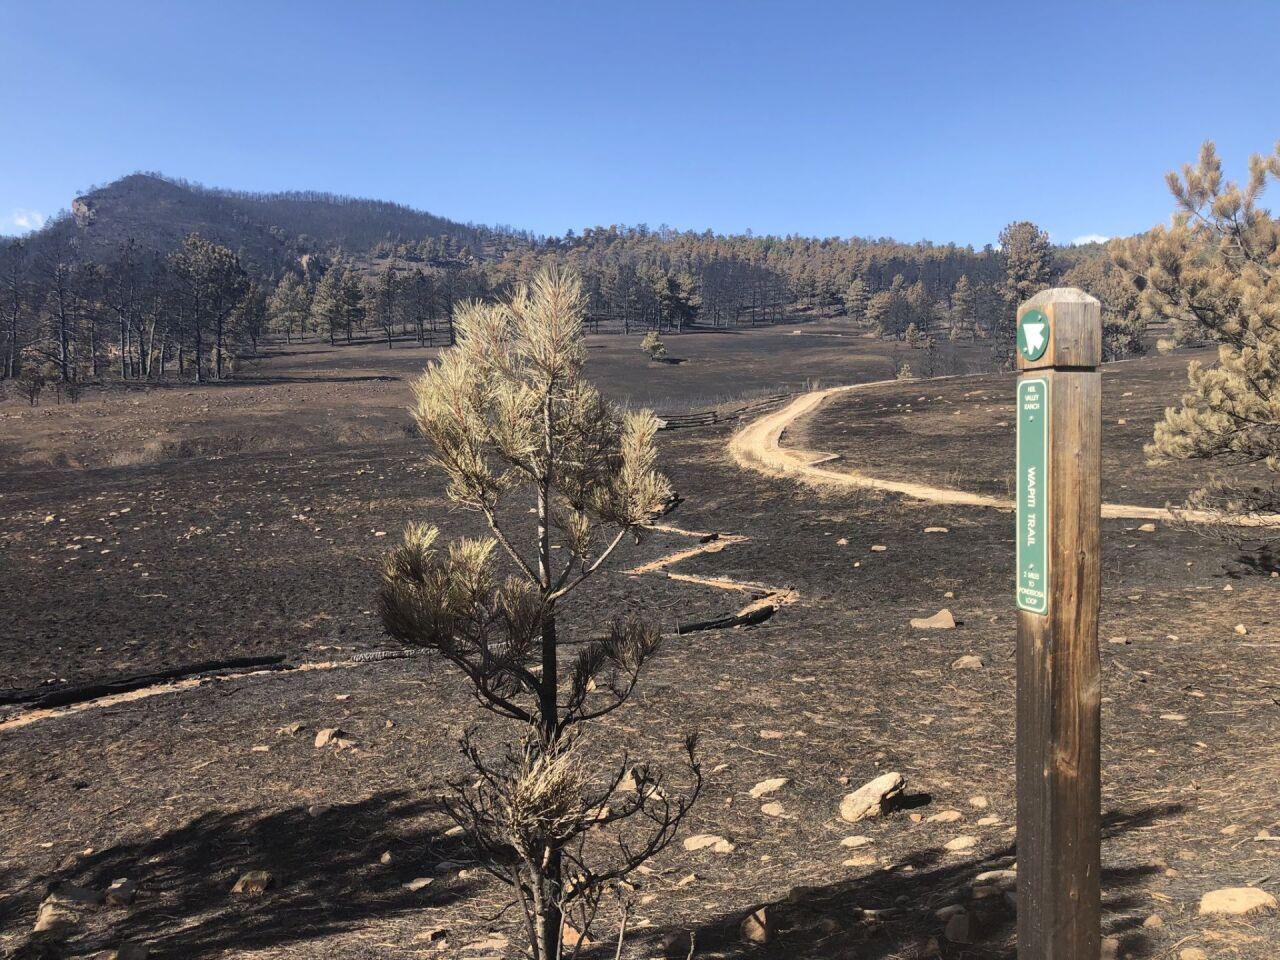 Wapiti Trail at Heil Valley Ranch